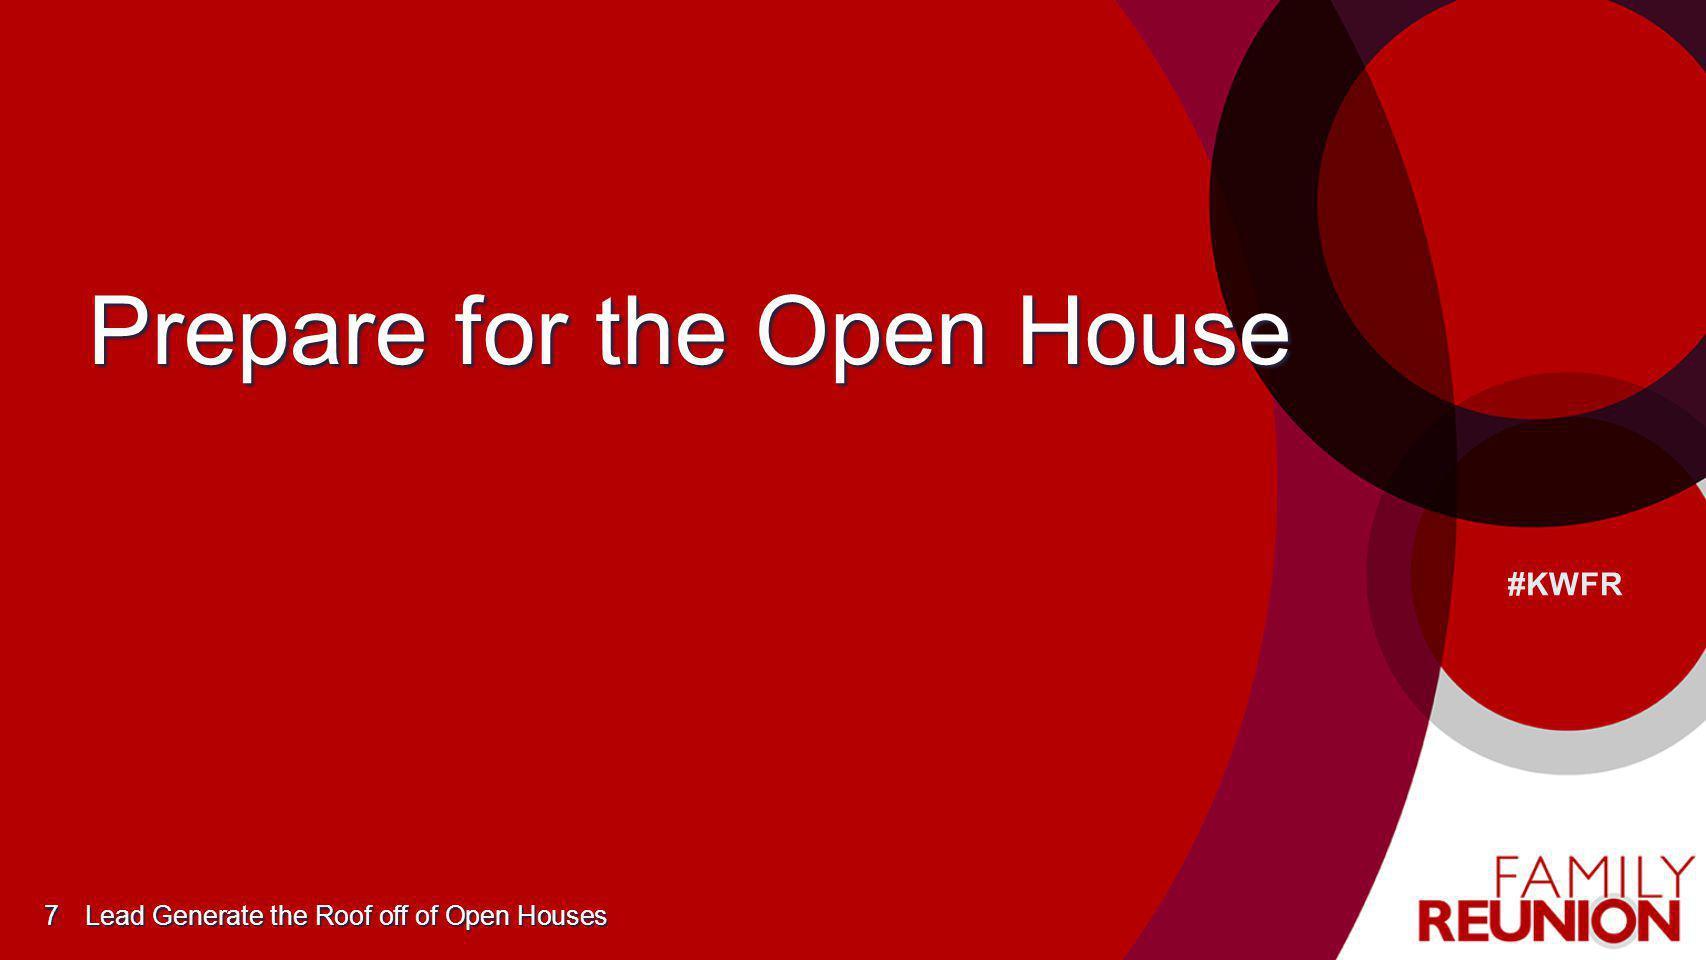 Prepare for the Open House